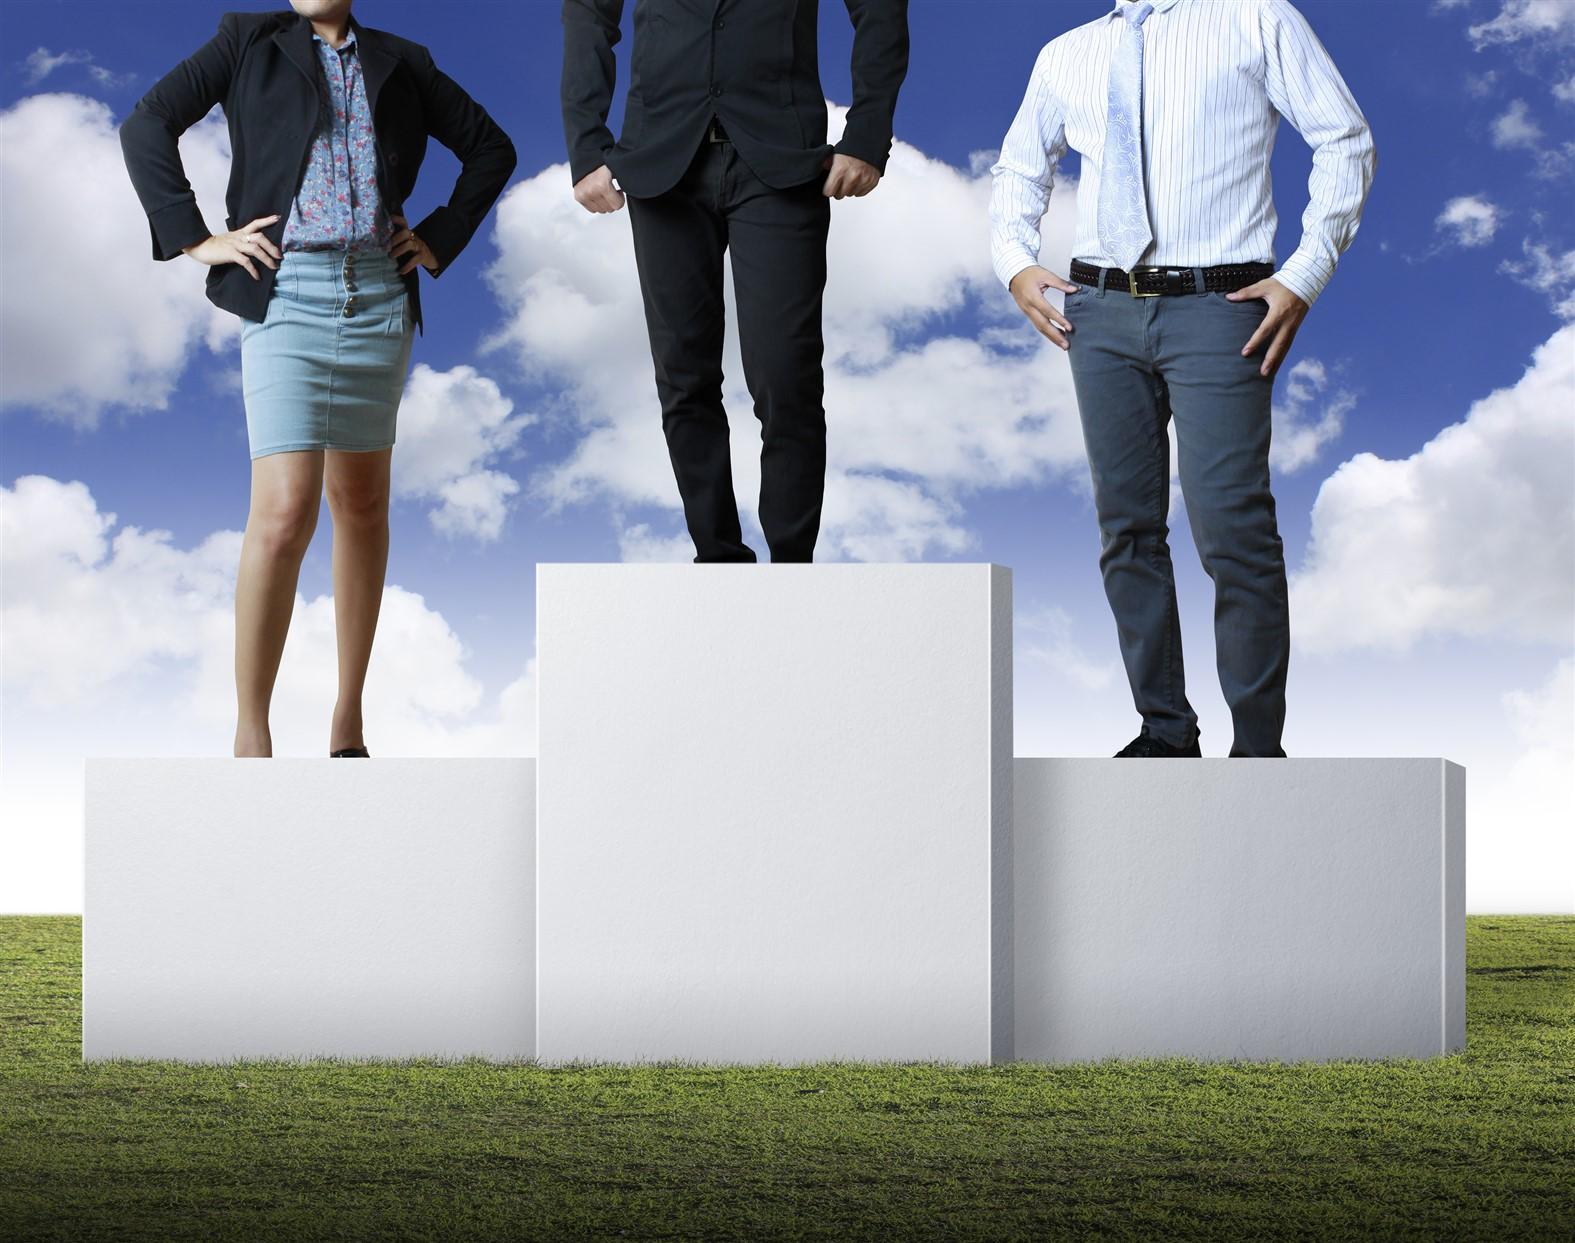 bigstock-Business-people-on-the-podium-27028529